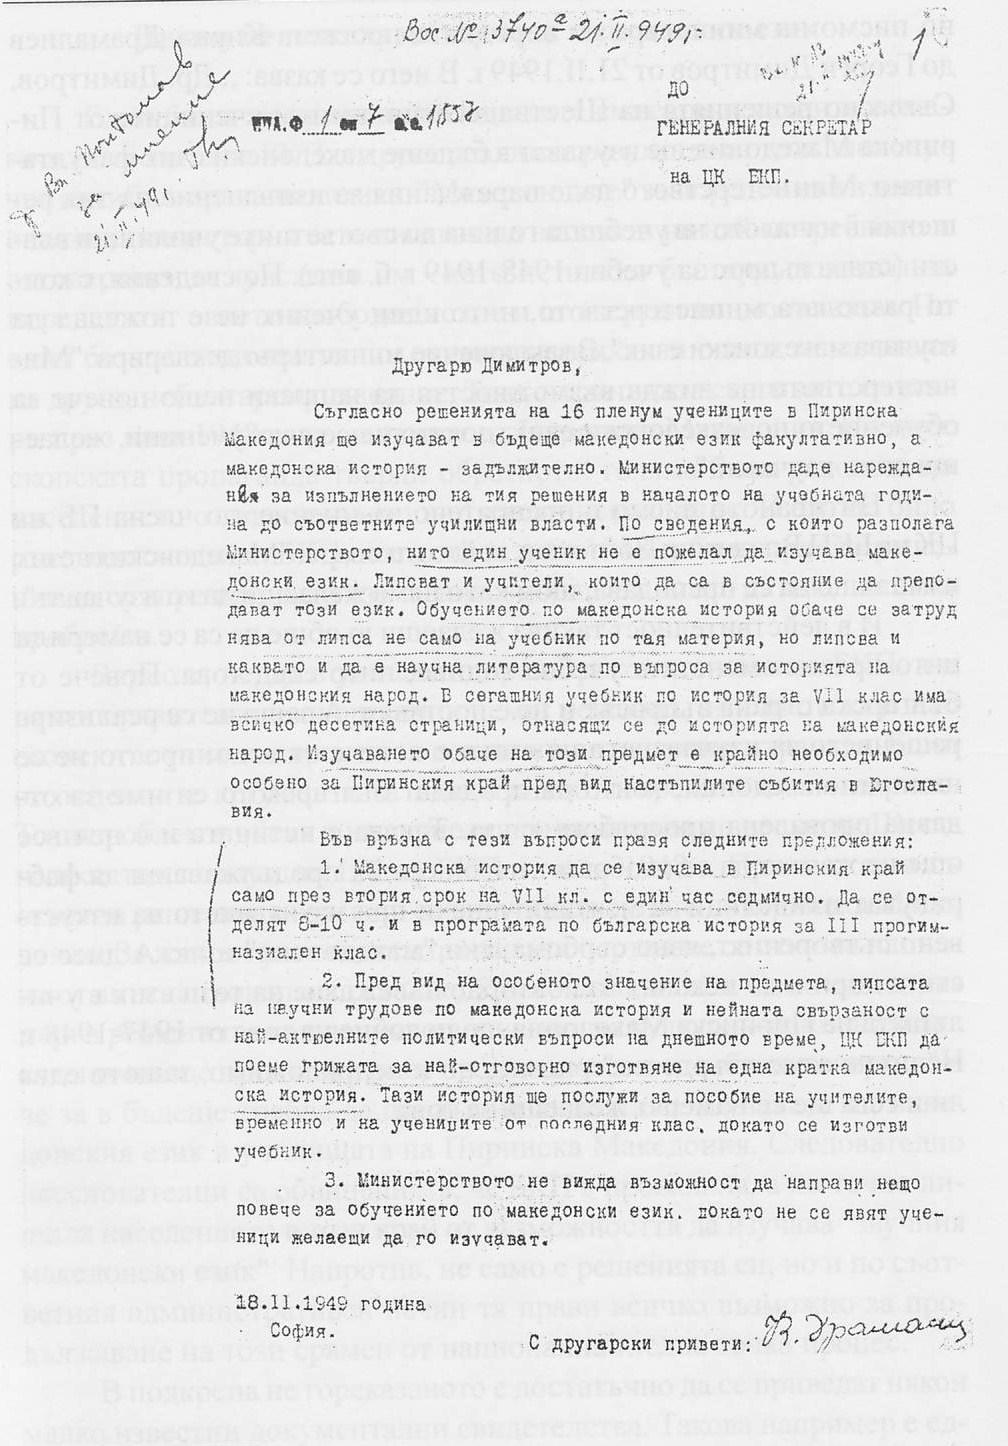 Зошто Бугарија прво ги призна Македонците а потоа се пишмани? - Page 5 Letter_from_Kiril_Dramaliev_according_the_cultural_authonomy_in_Pirin_Macedonia